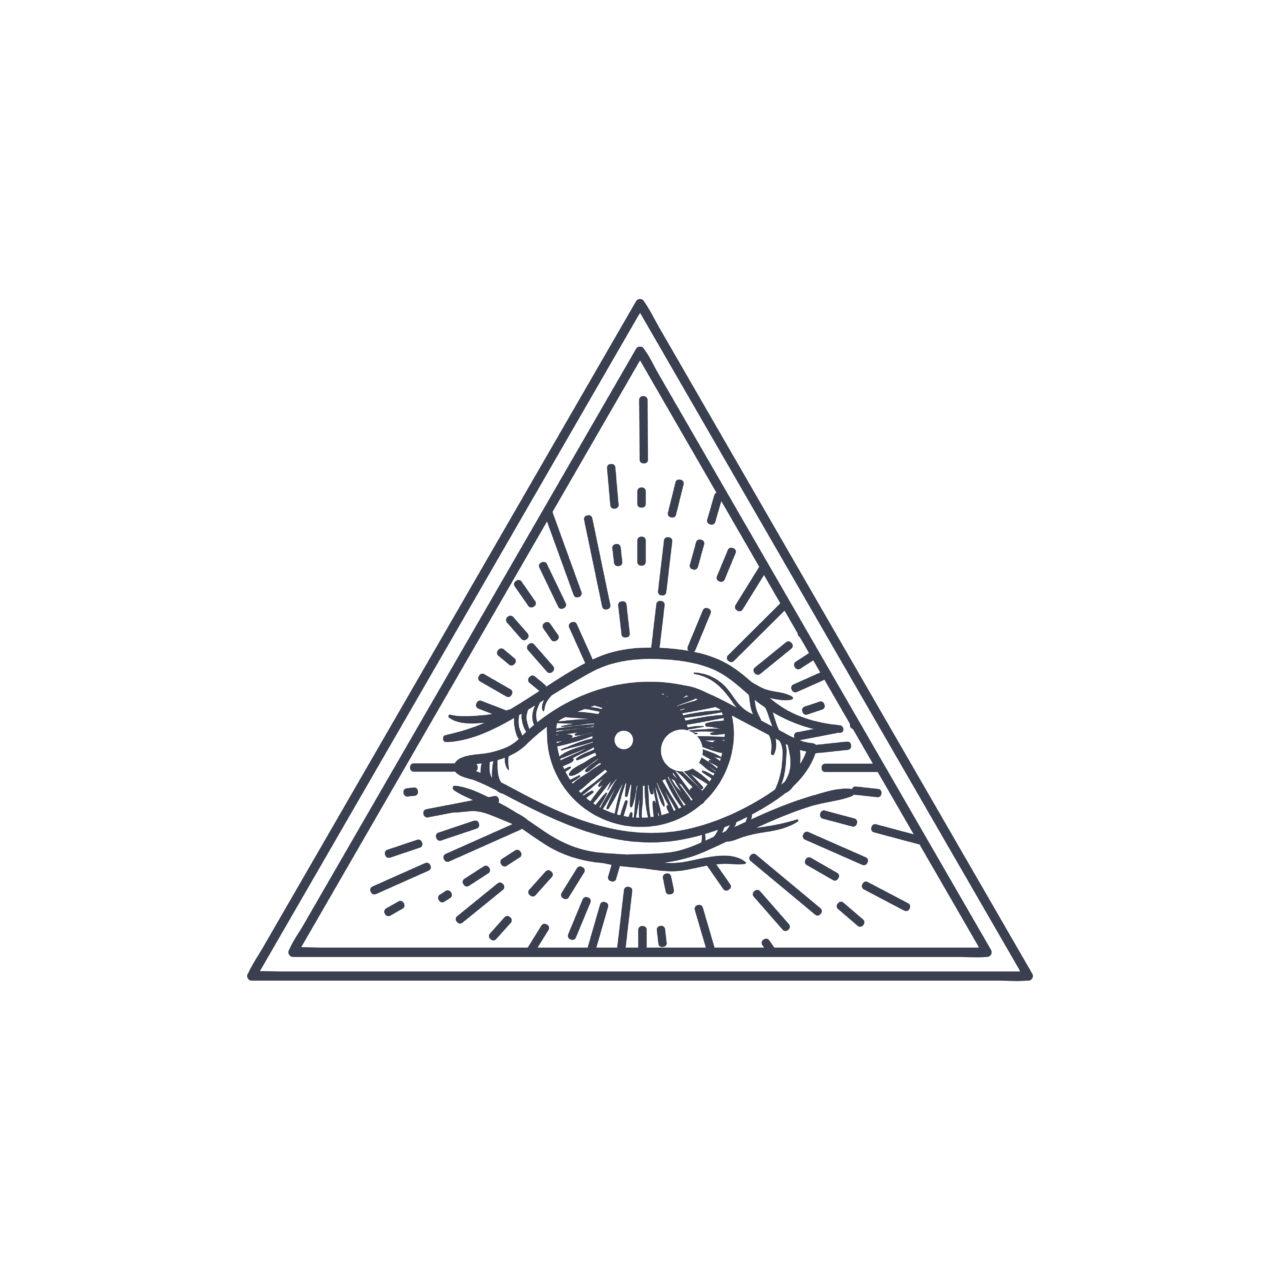 https://www.astriefuturo.it/wp-content/uploads/2020/07/All-Seeing-Eye-in-Triangle1-1280x1280.jpg